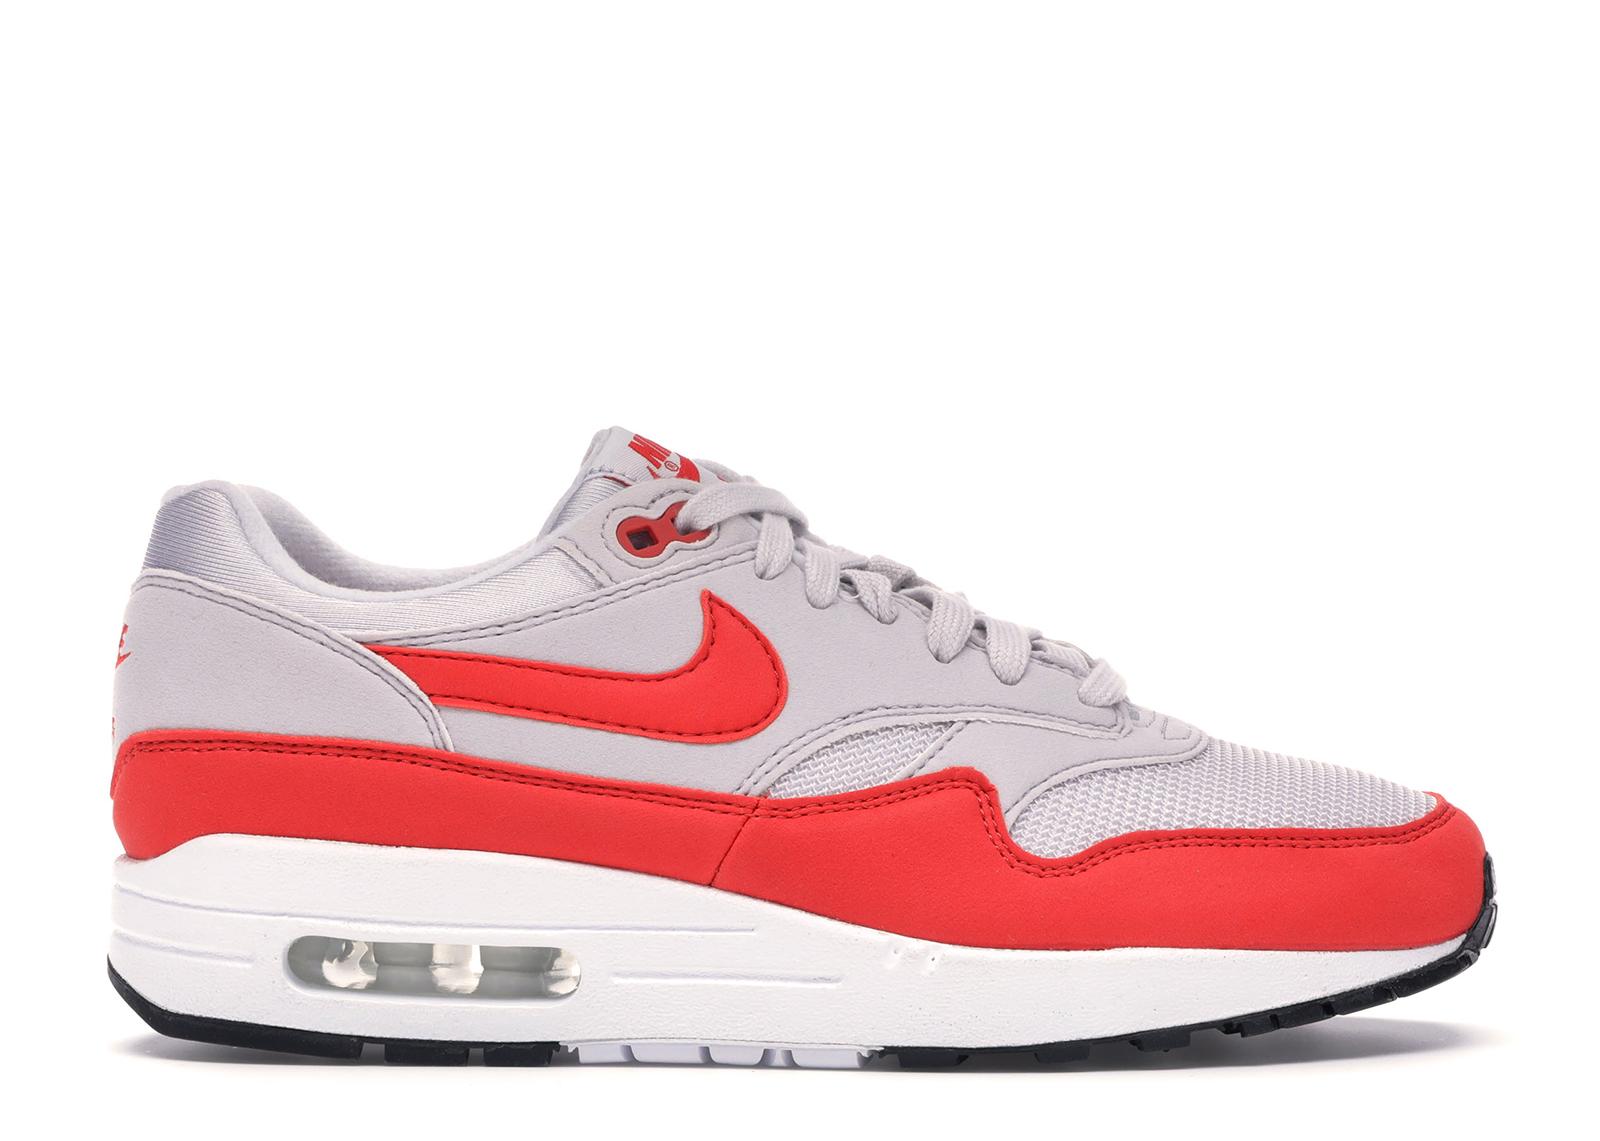 Nike Air Max 1 Habanero Red (W